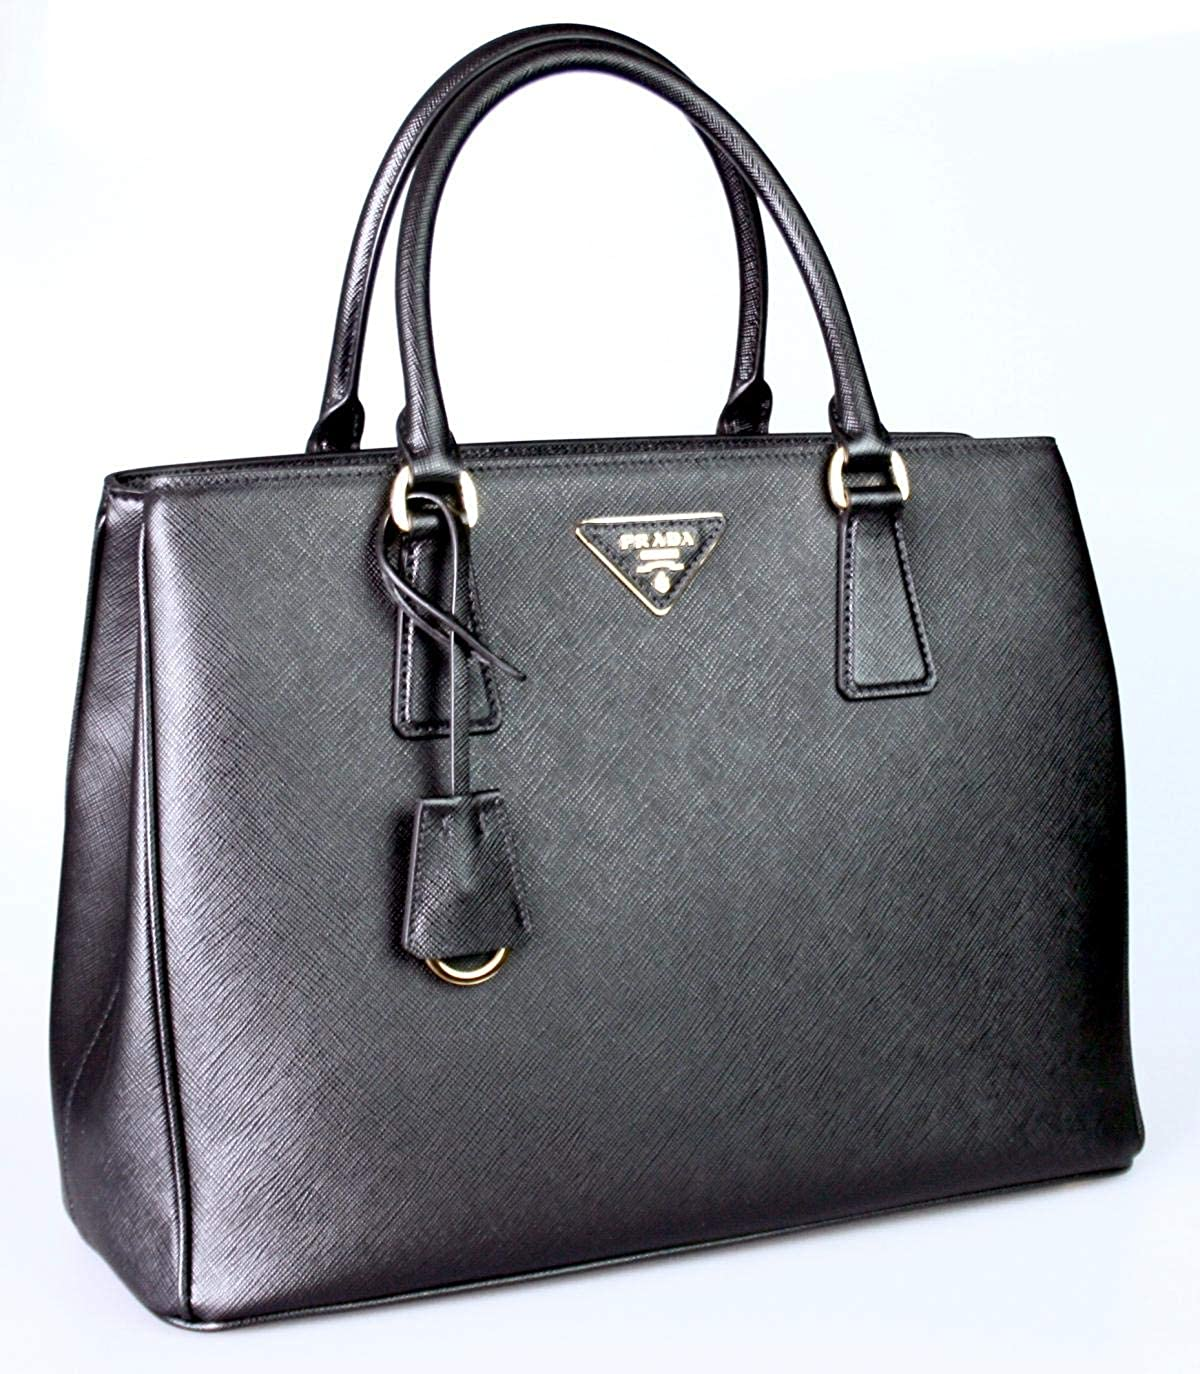 27ea2c36aa57 Prada Women's Saffiano Lux Black Handbag 1BA874: Handbags: Amazon.com